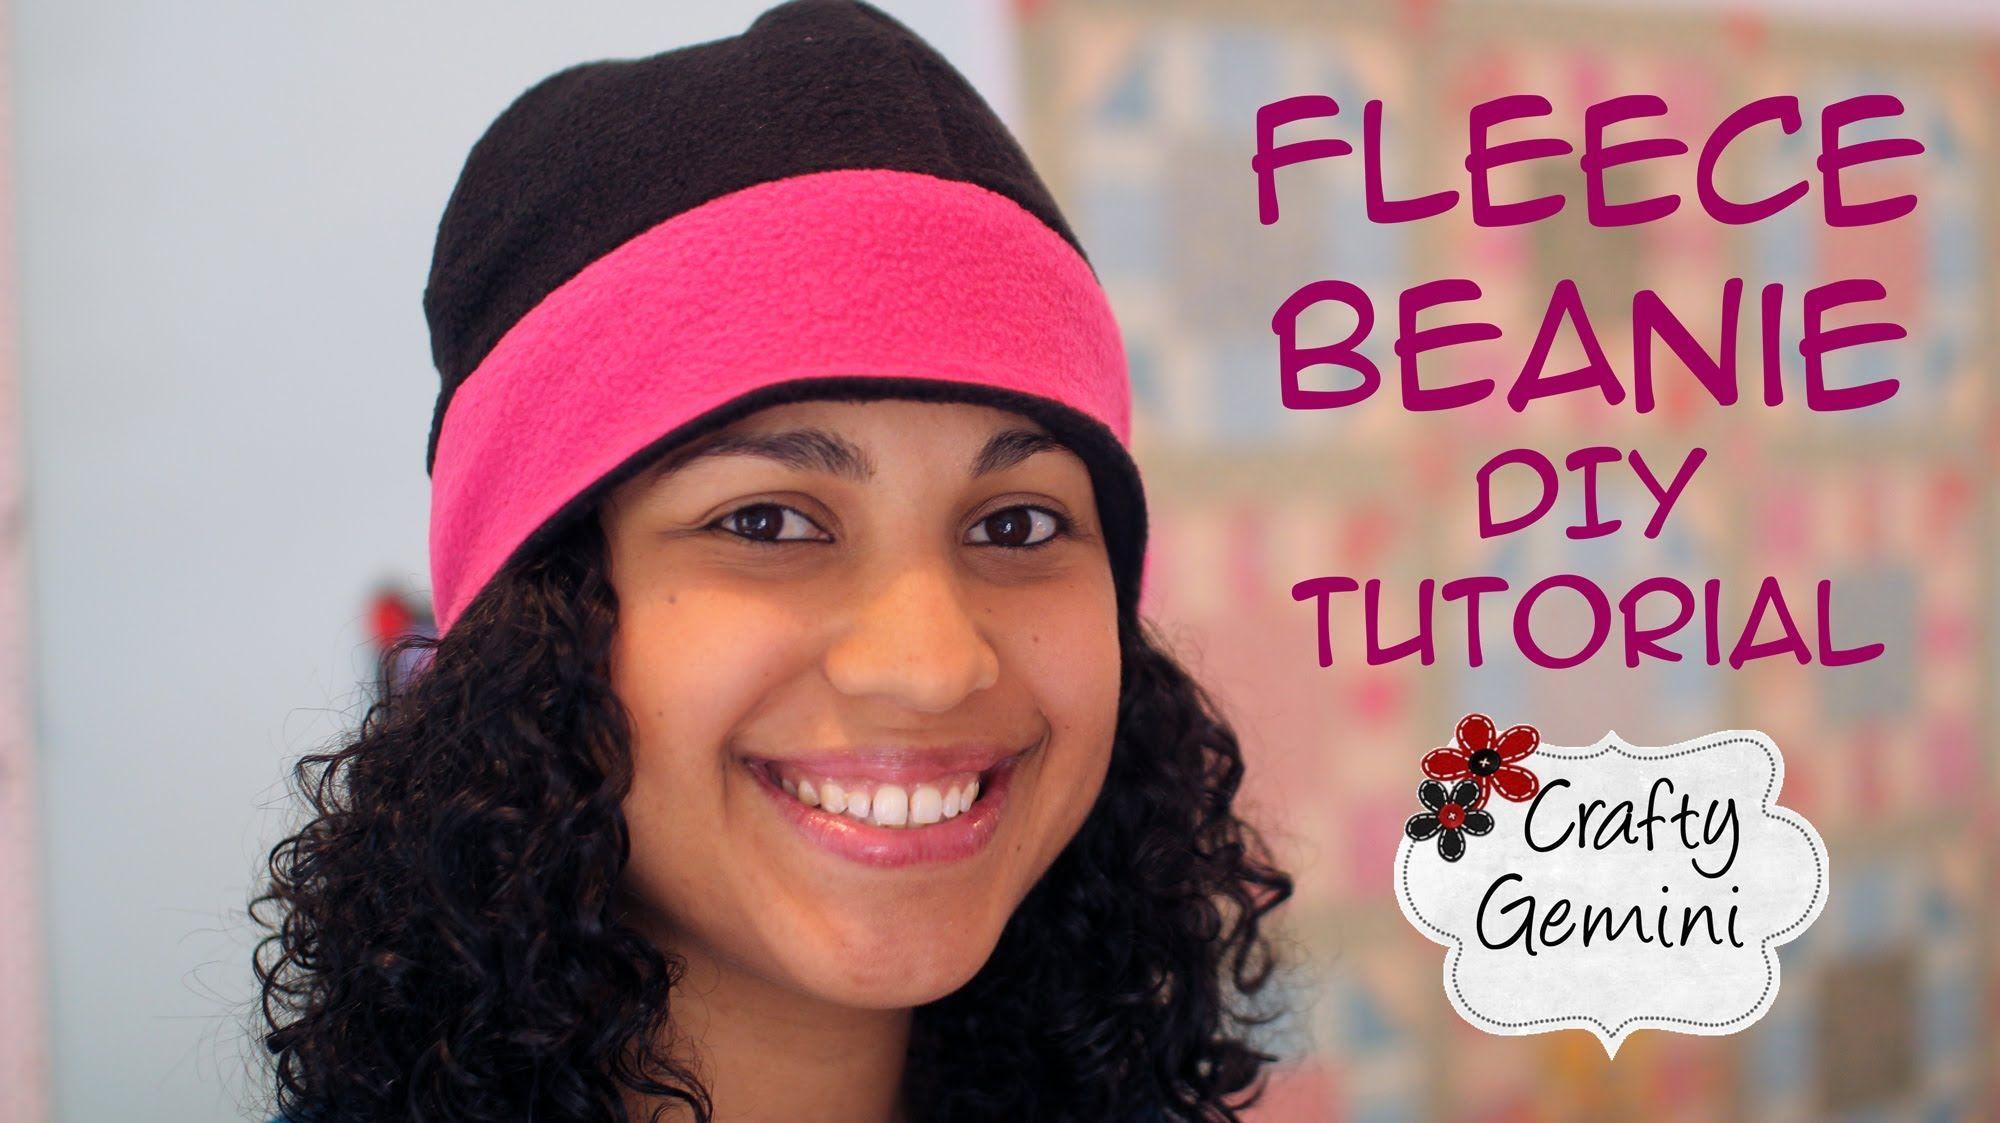 Fleece Beanie Hat- DIY Tutorial | Quilting | Pinterest